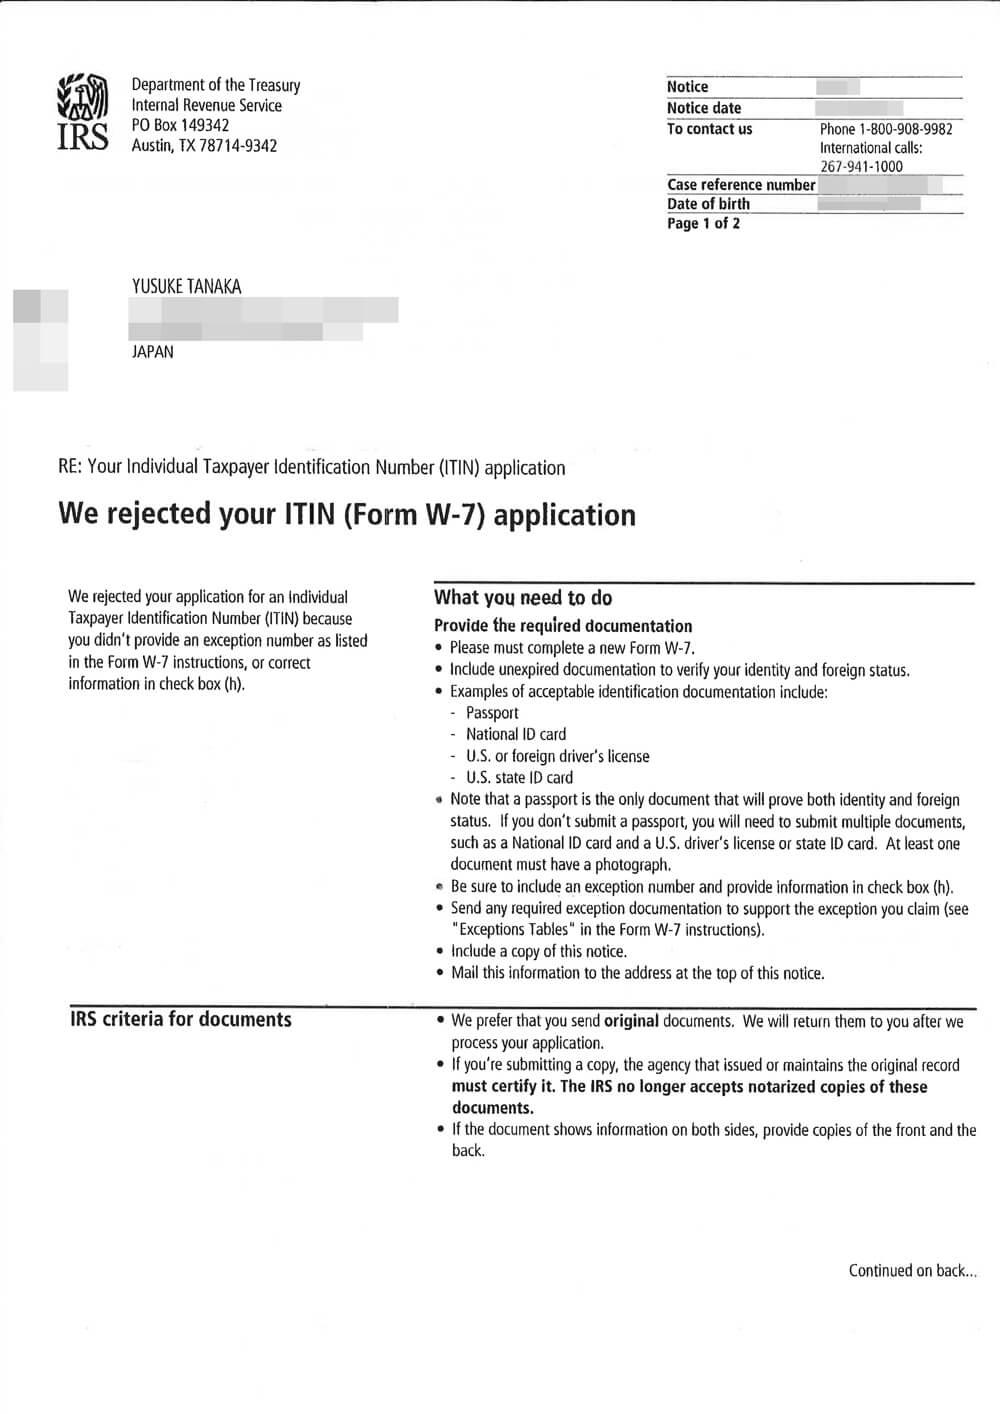 ITINの申請書類が返却された時の手紙